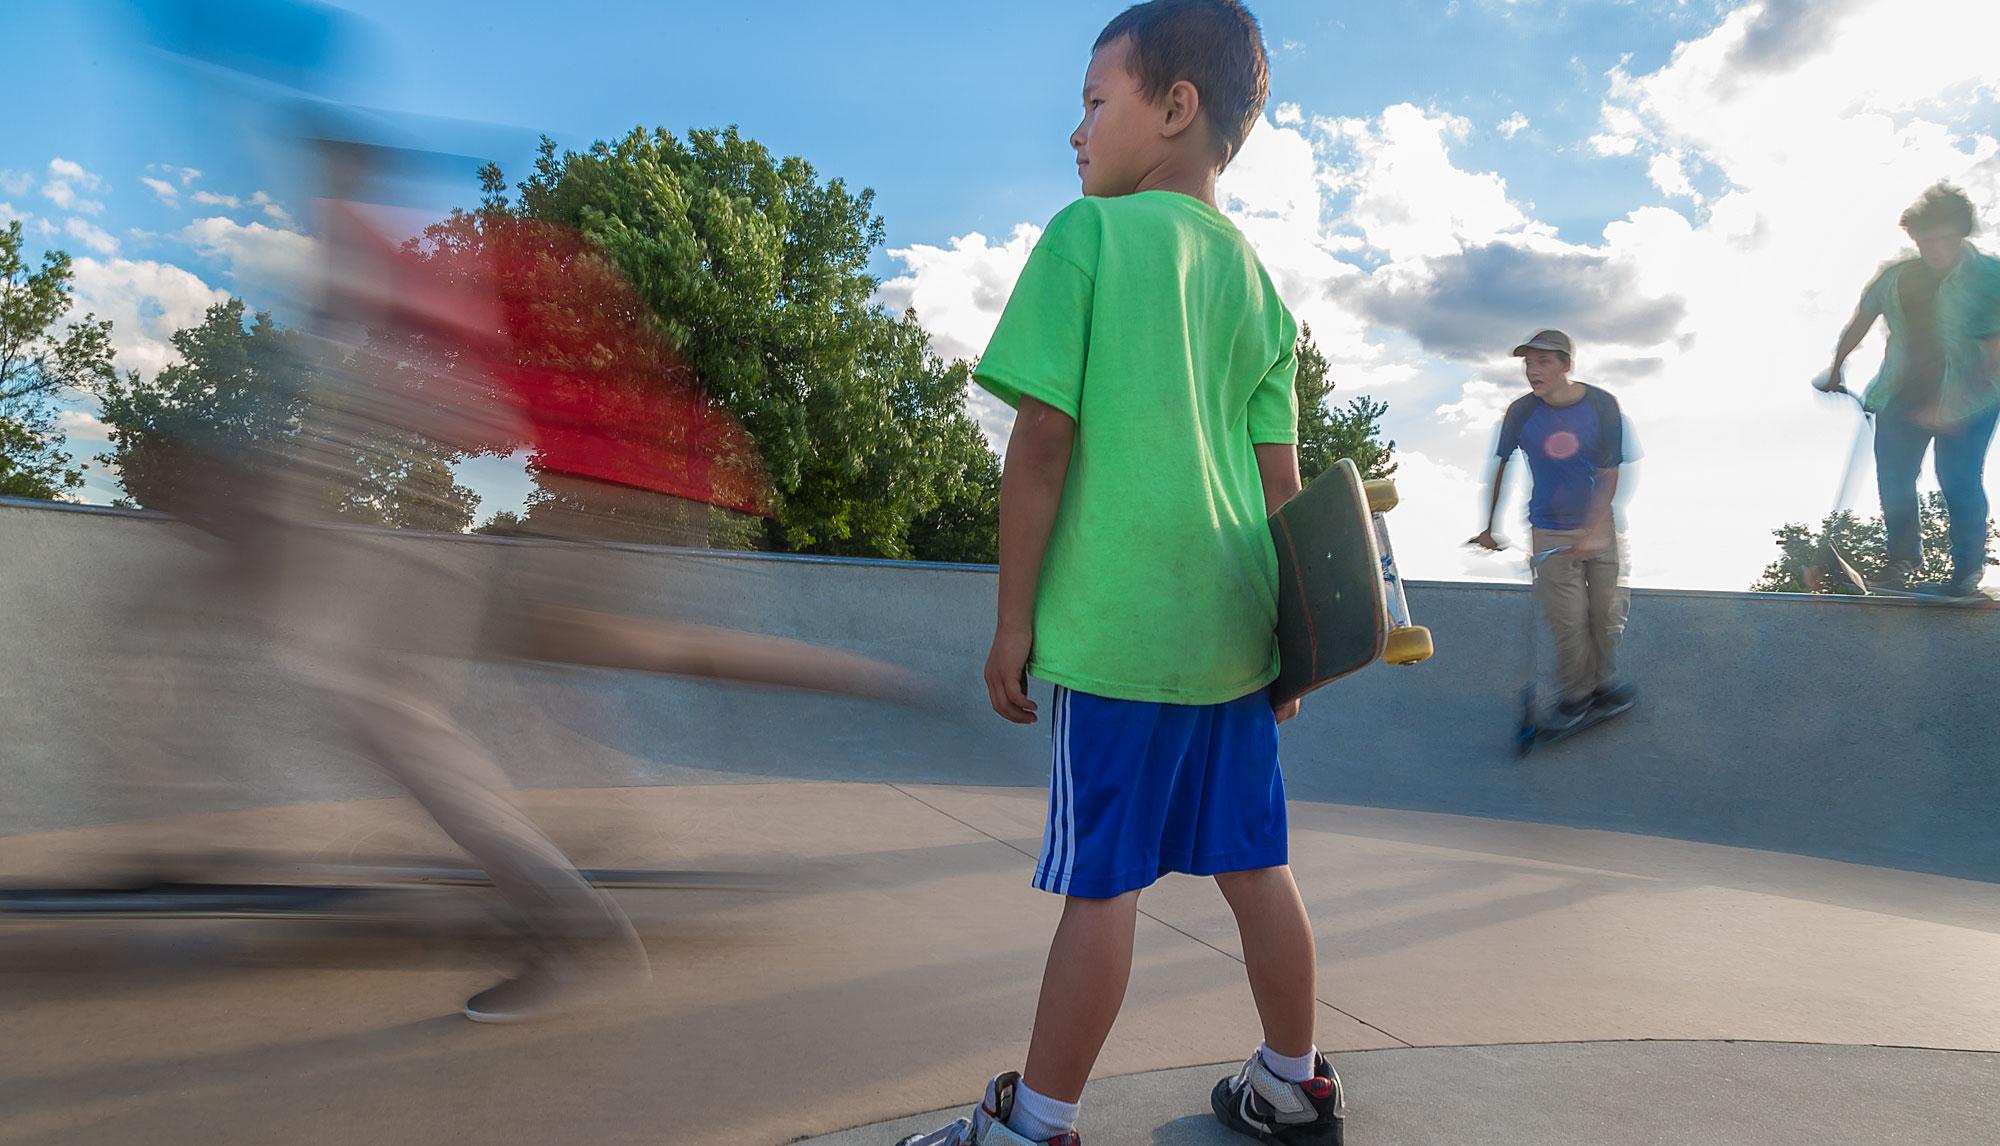 IMAGE: Kids at Skate Park